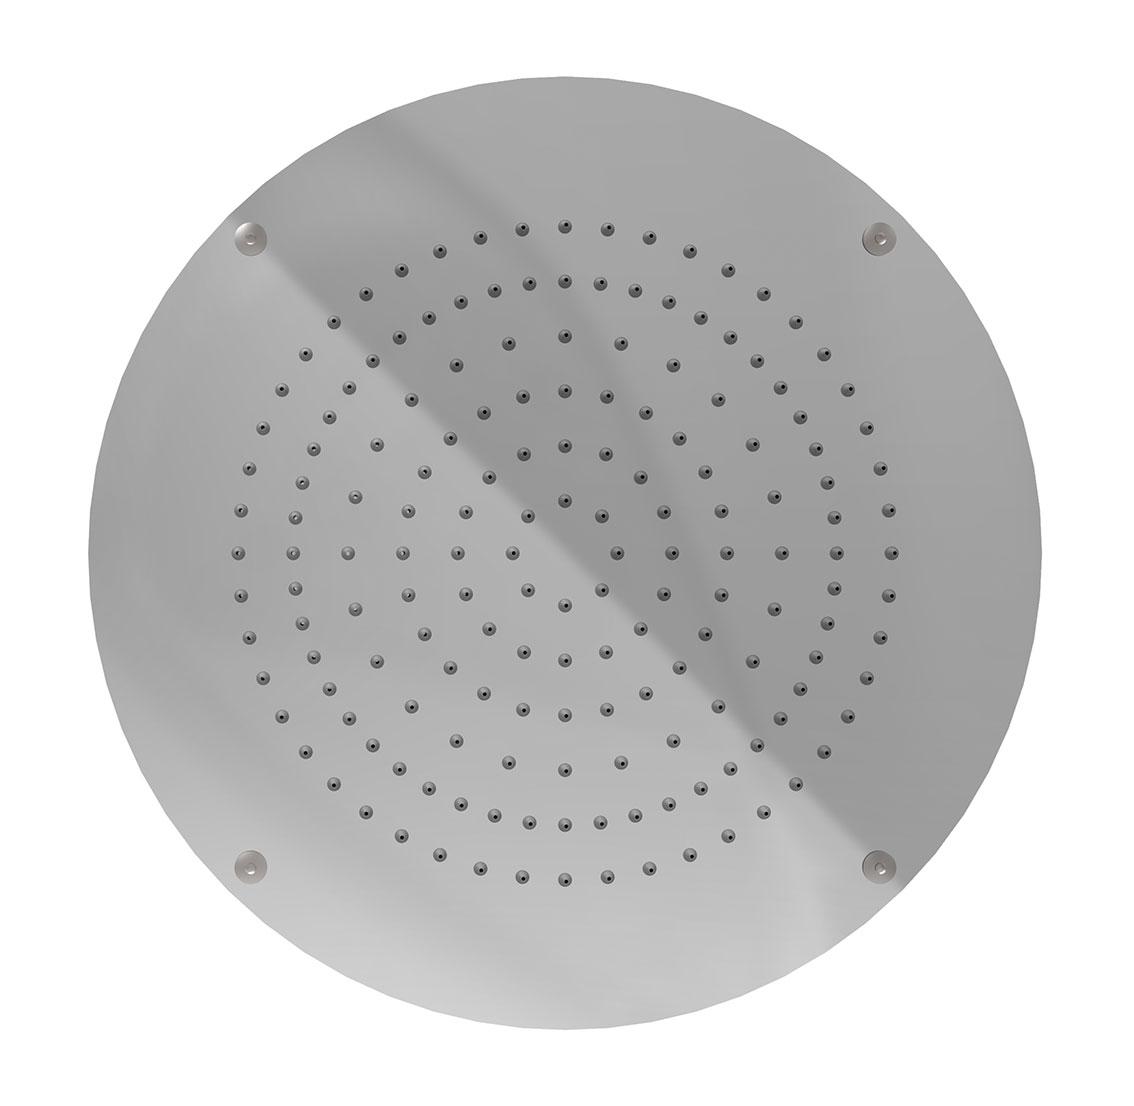 soffione-doccia-acciaio-inox-rotondo-ad-incasso-diam-350-3.jpg